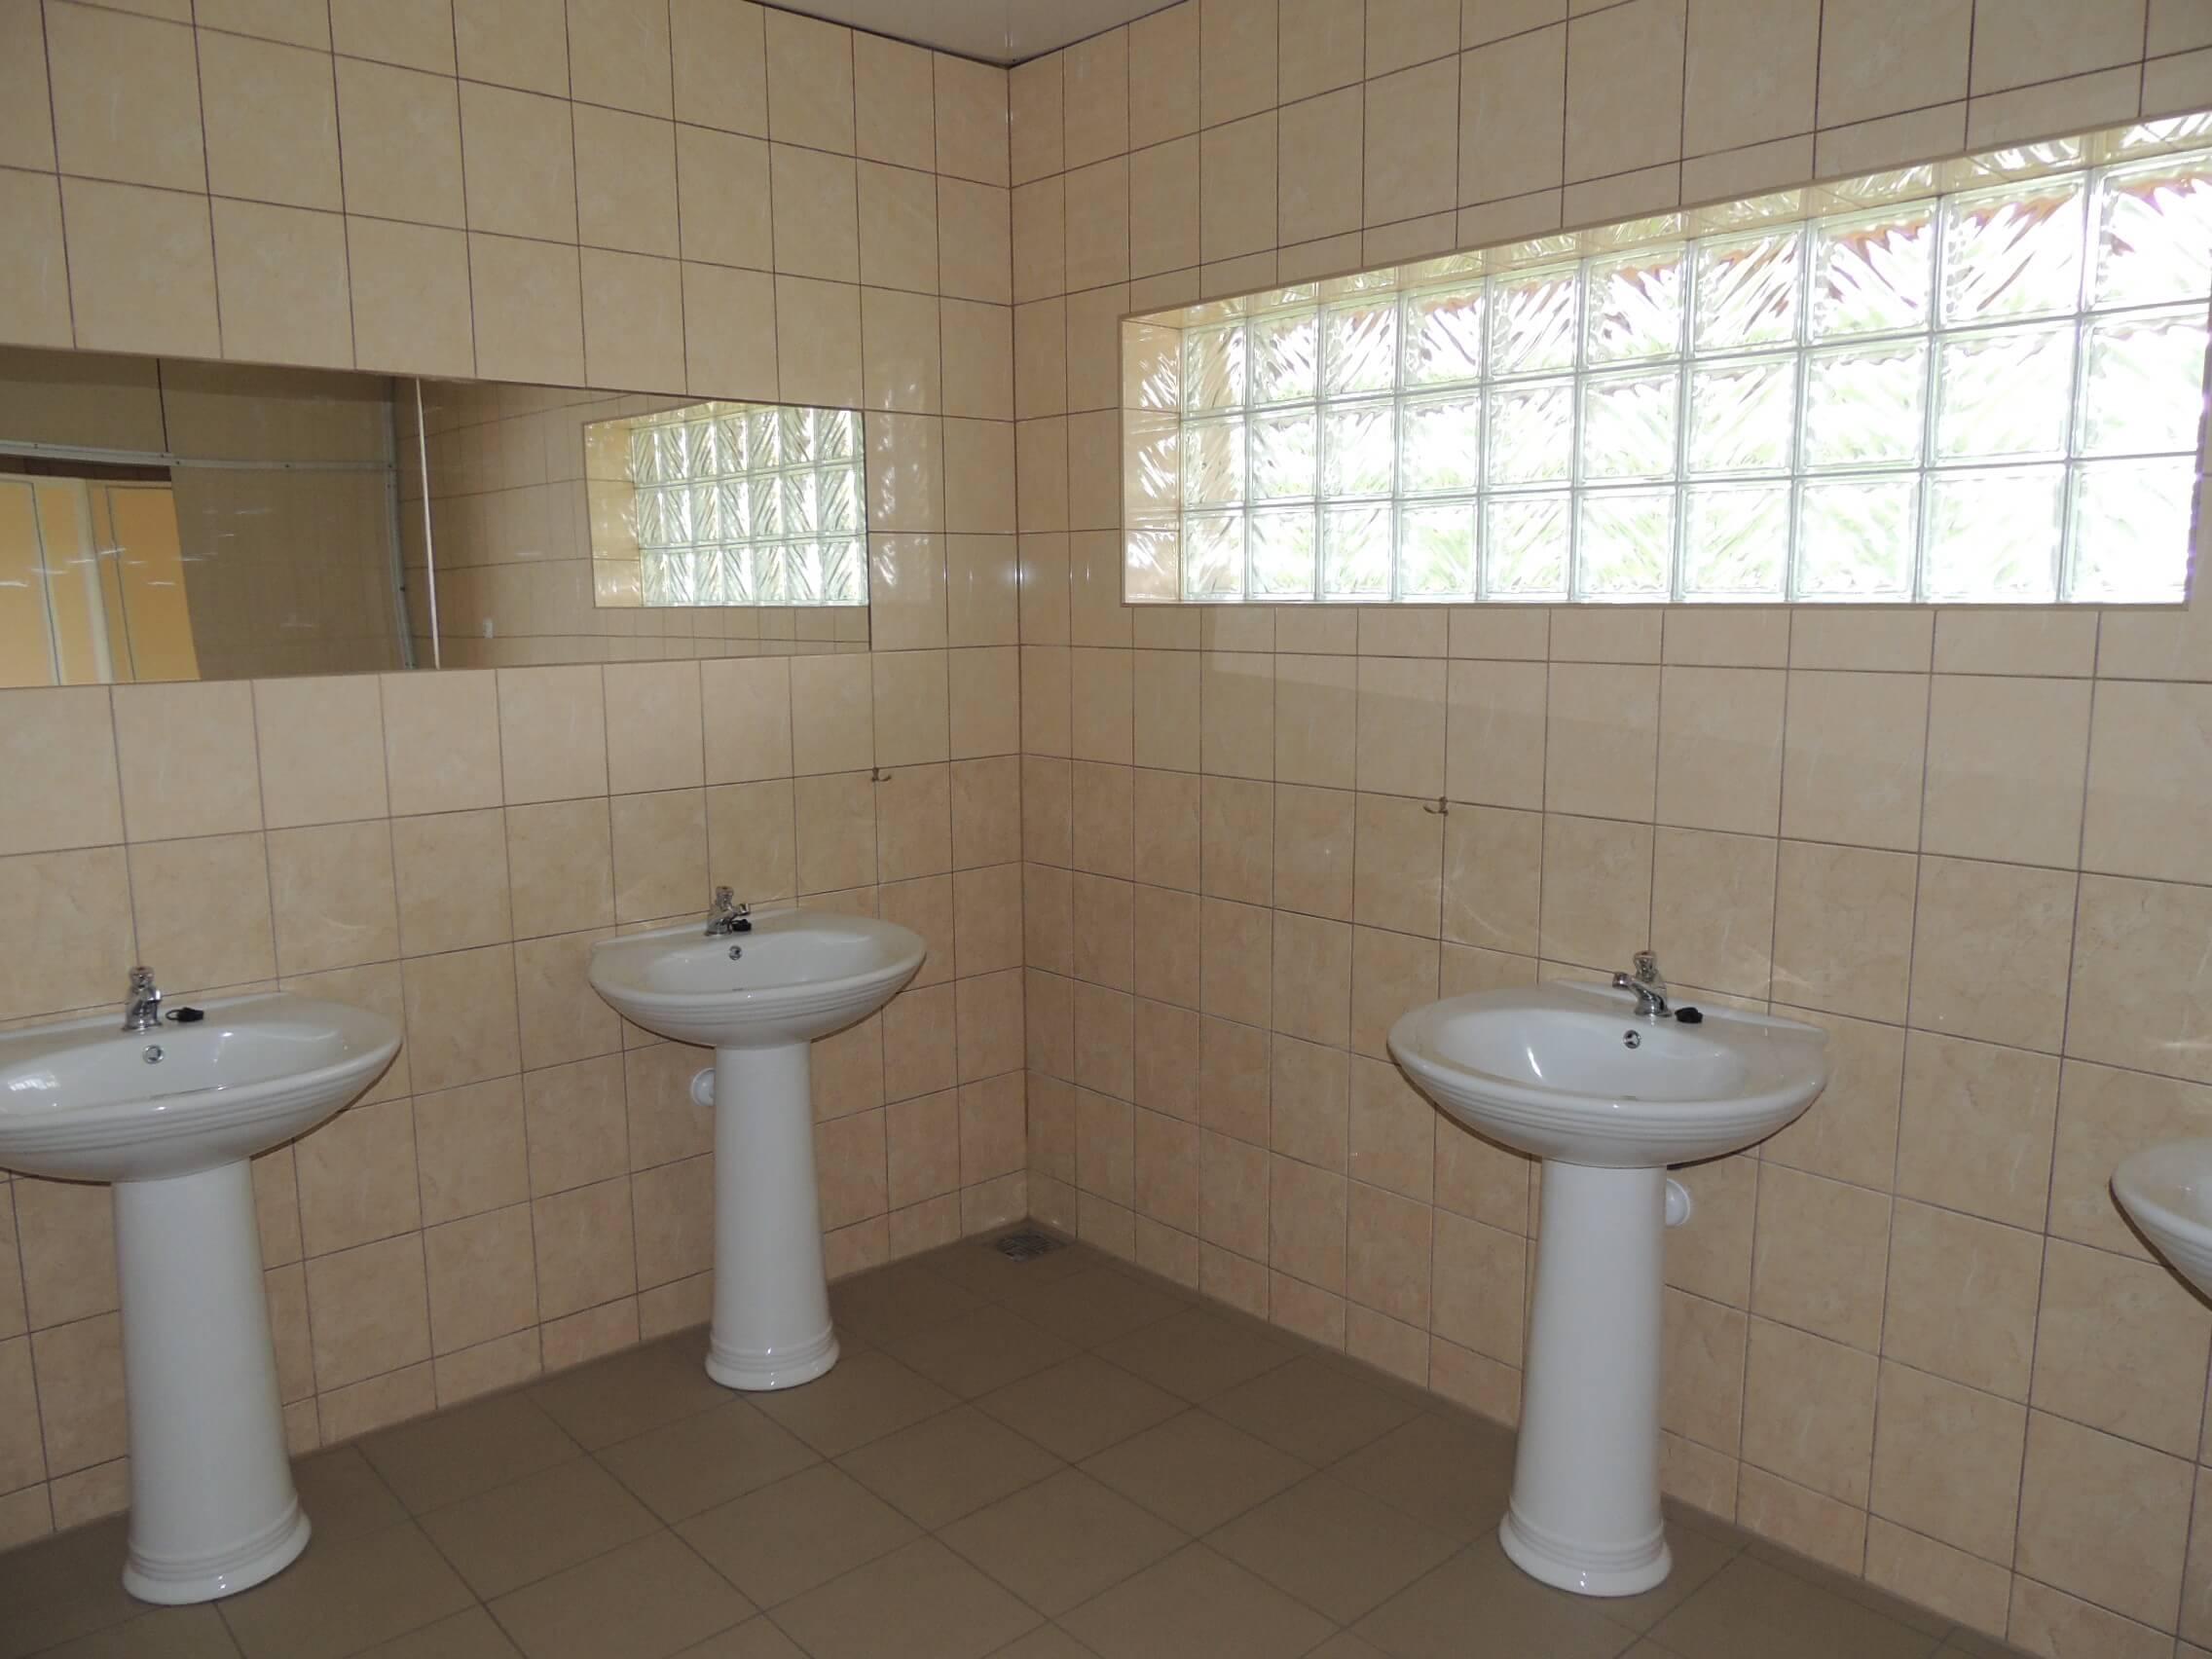 budynek: sanitariaty - 4 umywalki